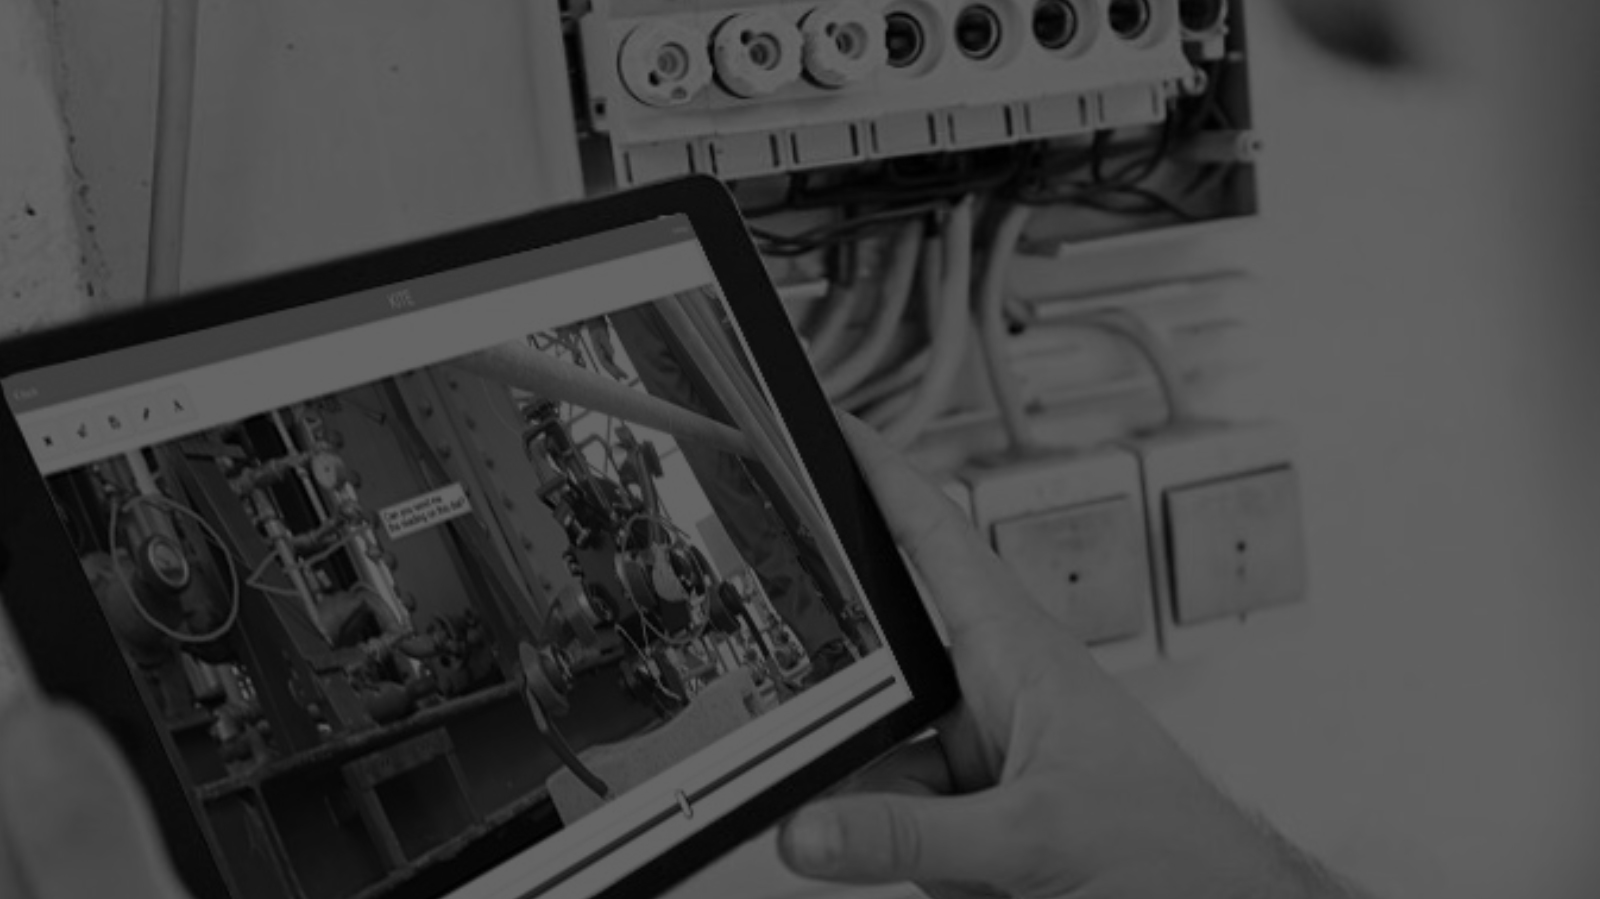 Live Remote Worker Test for UTEC Survey